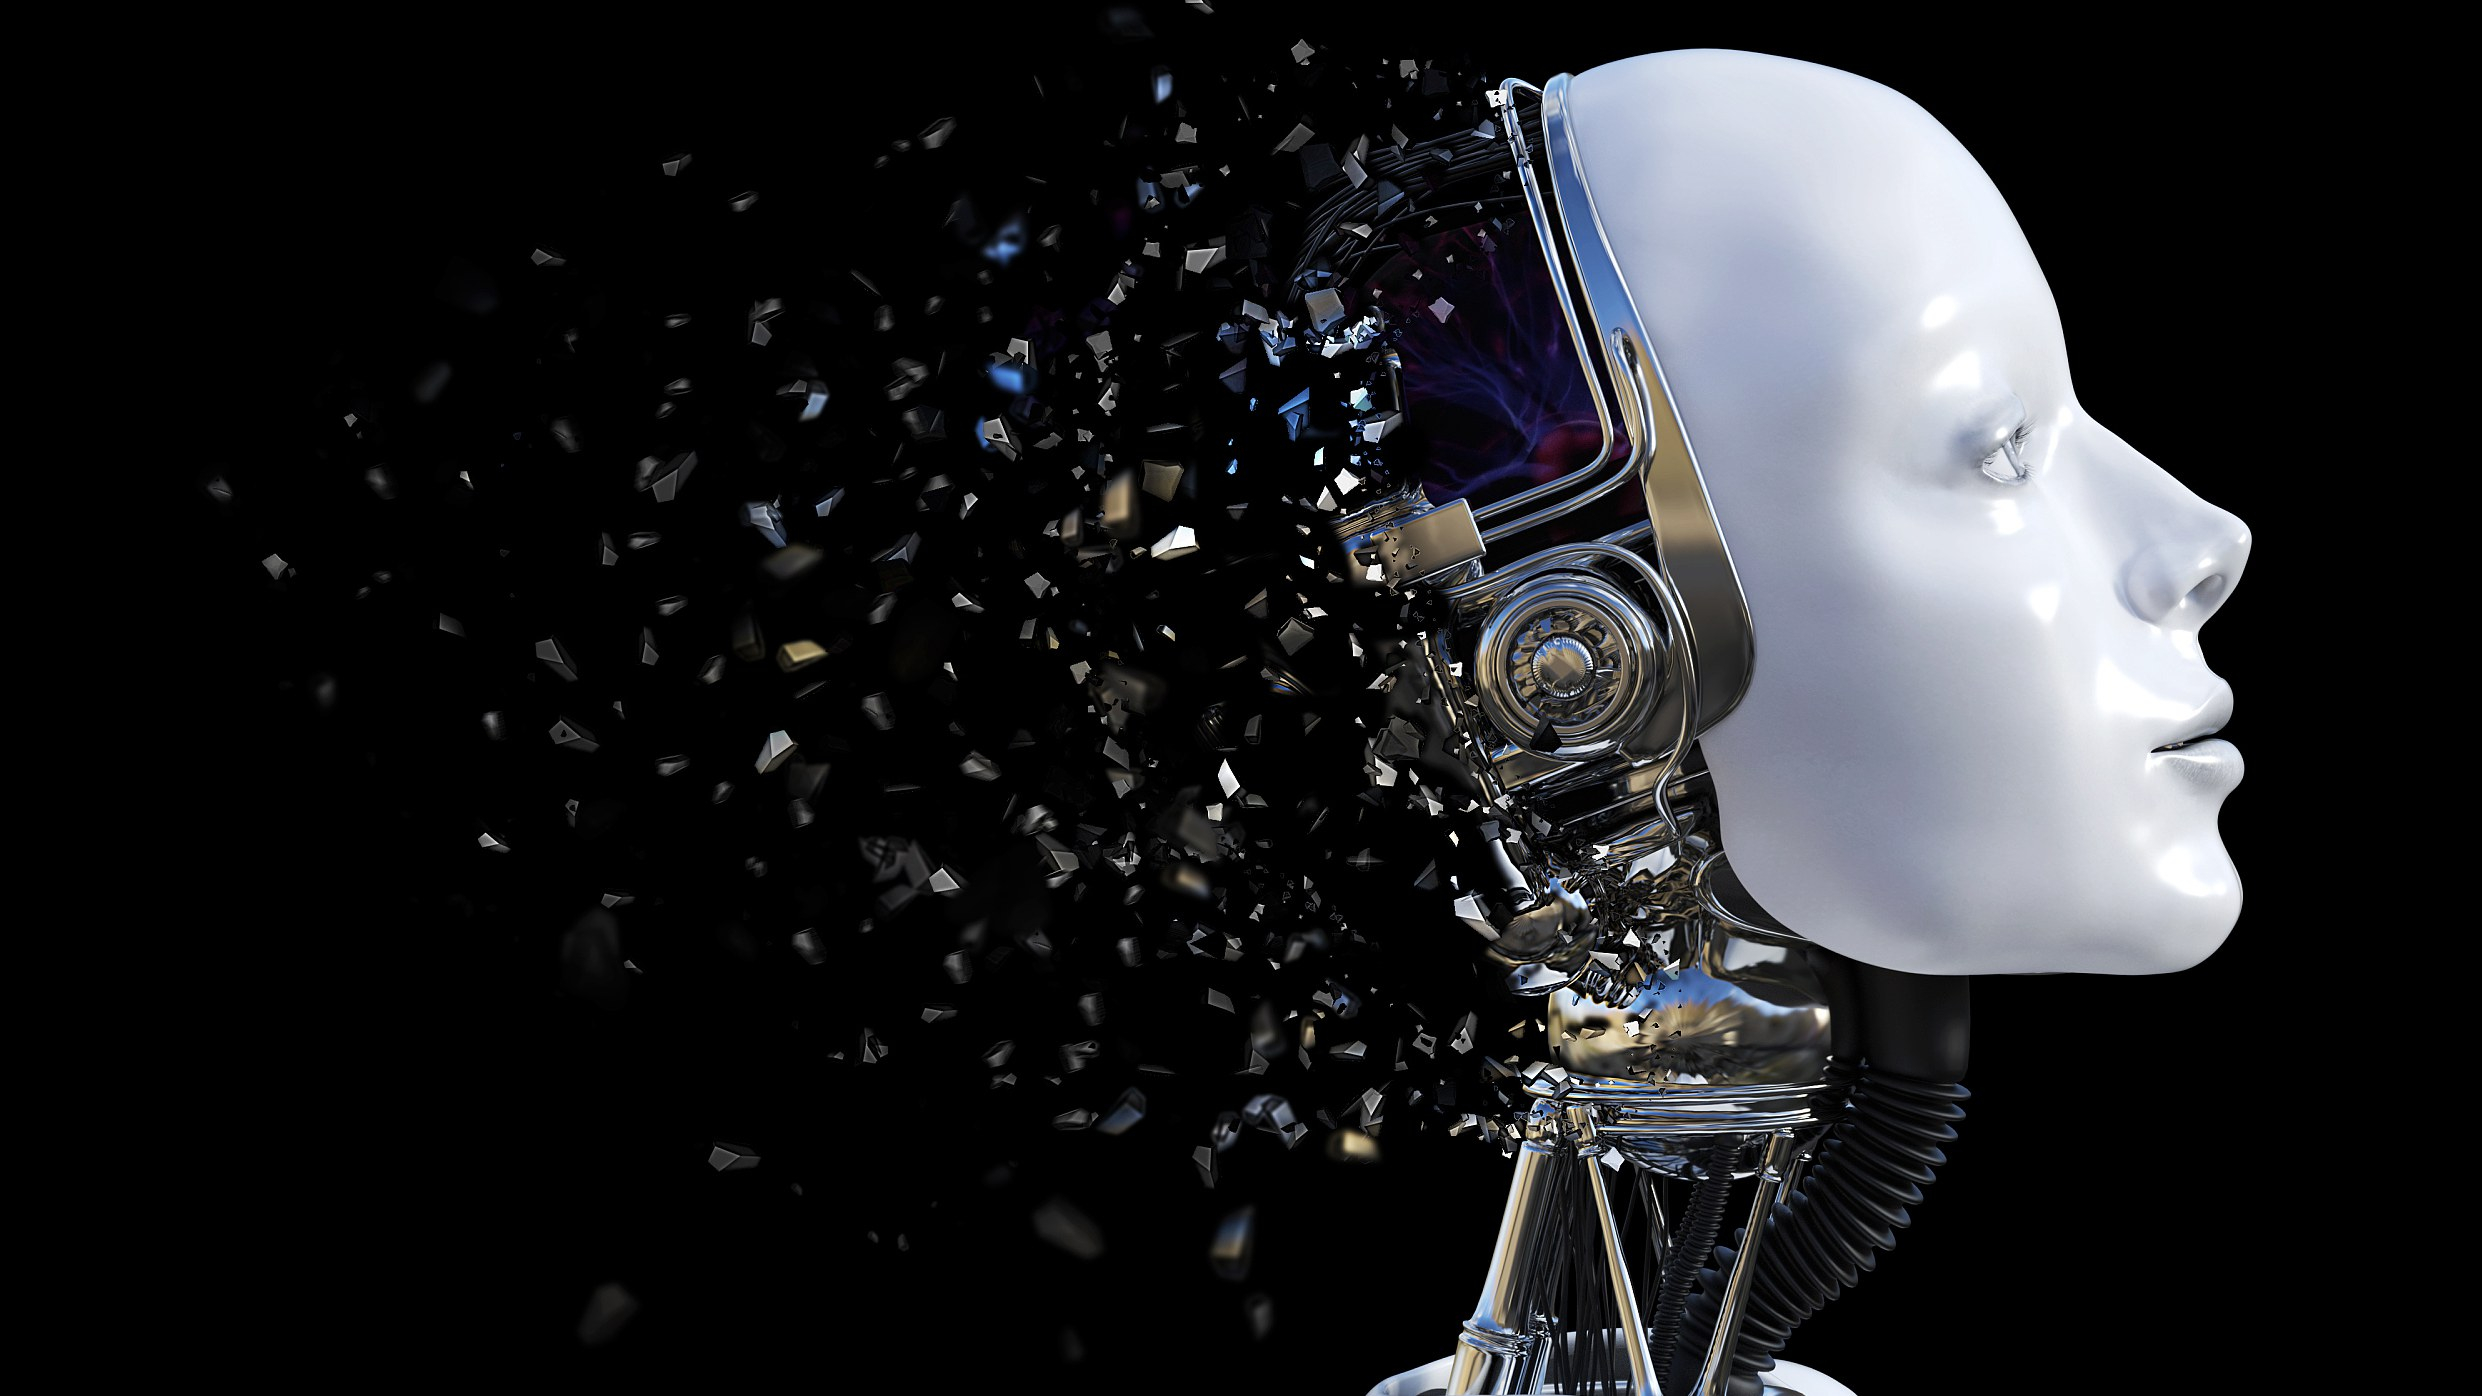 Baidu, Neusoft Holdings form strategic partnership over AI industrialization